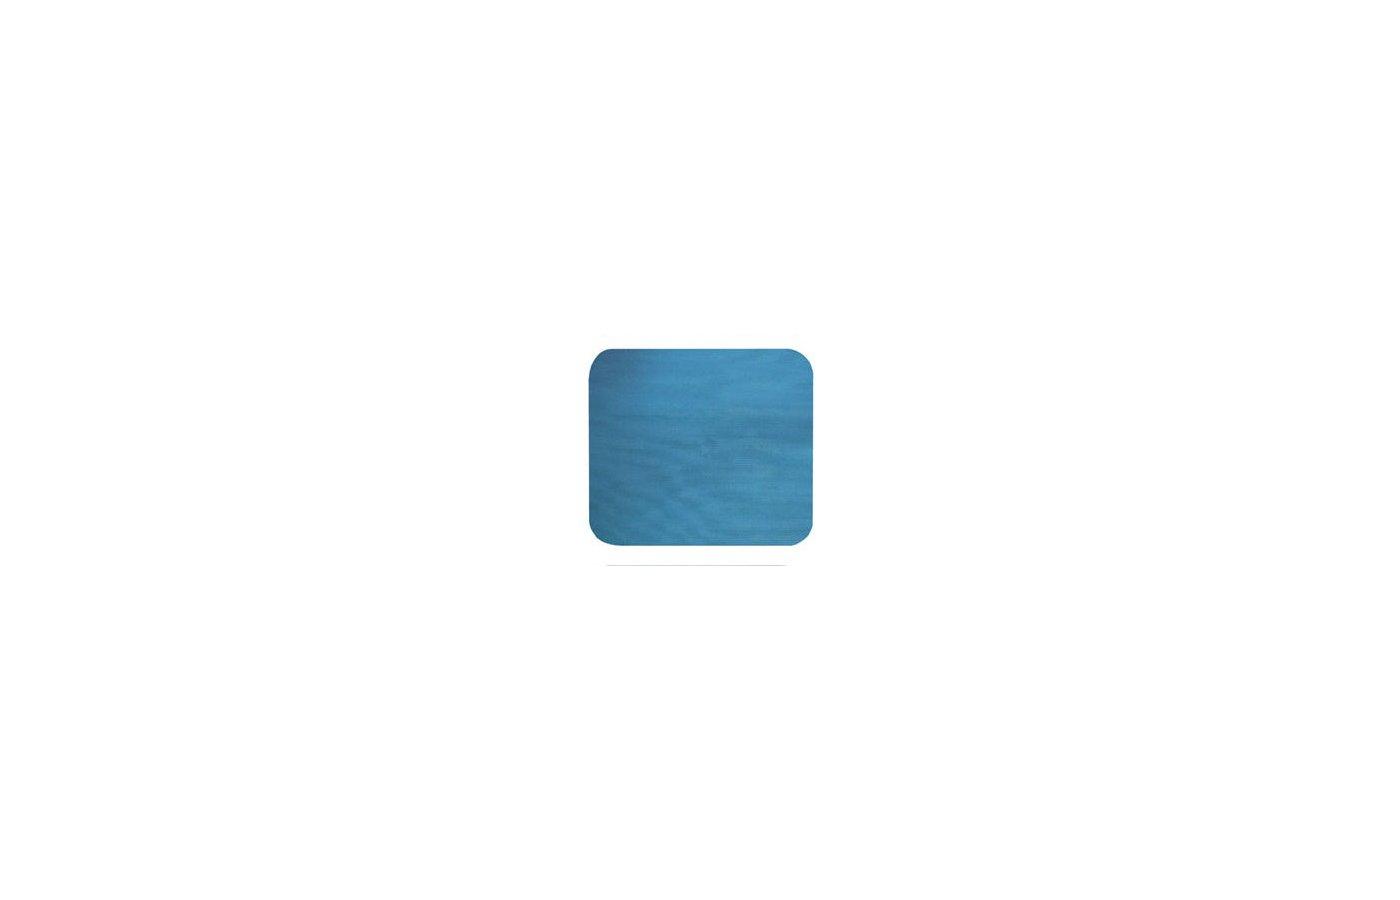 Коврик для мыши BURO BU-CLOTH/blue матерчатый синий